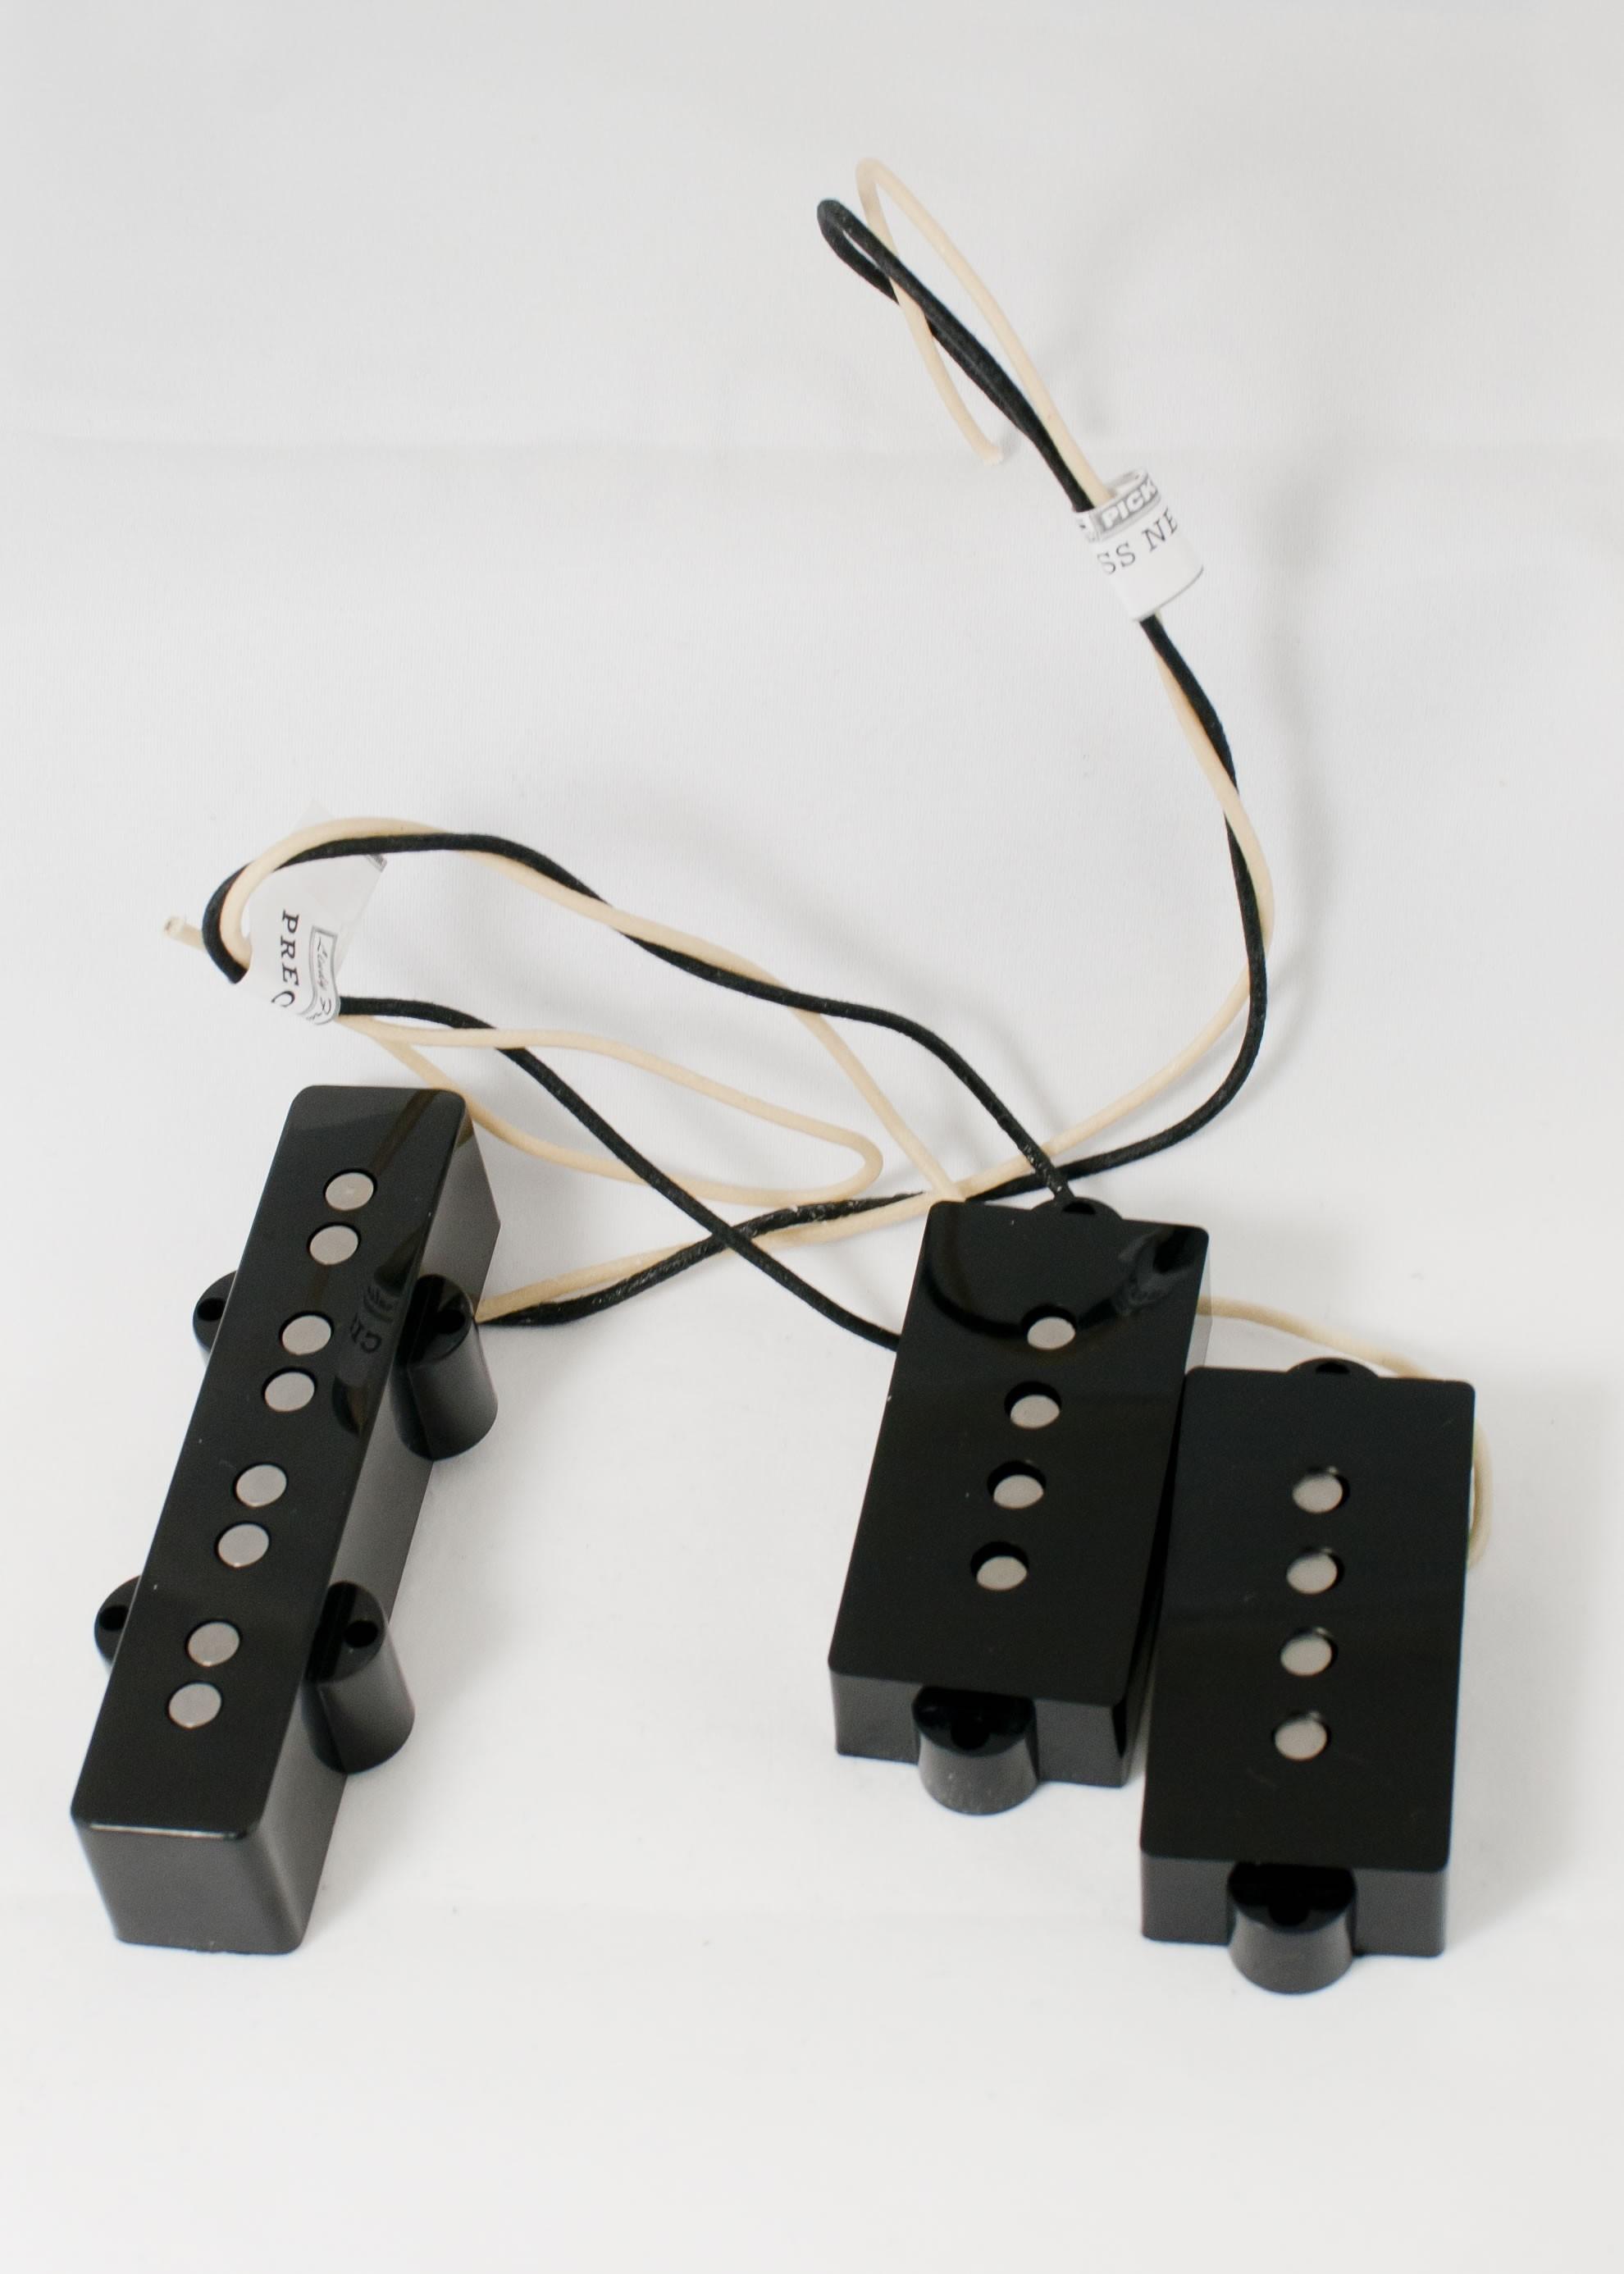 Lindy Fralin 4 String PJ Pickup Set Best Bass Gear – Lindy Fralin Wiring Diagram